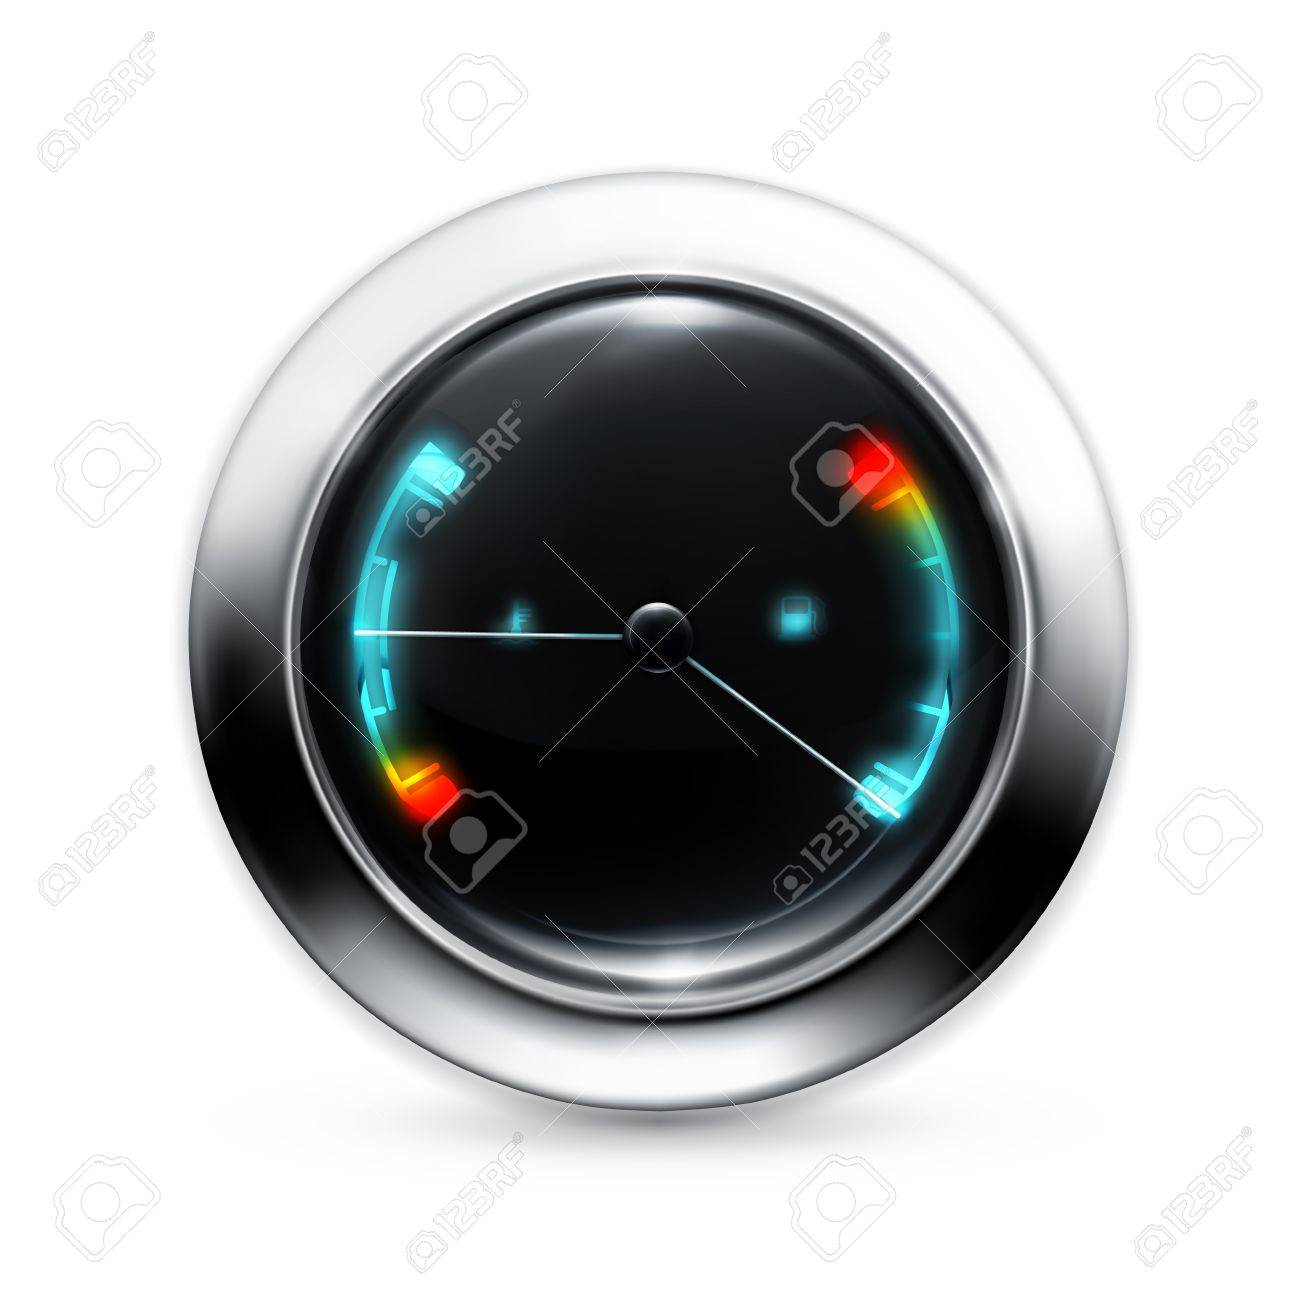 Fuel indicator Stock Vector - 13875693